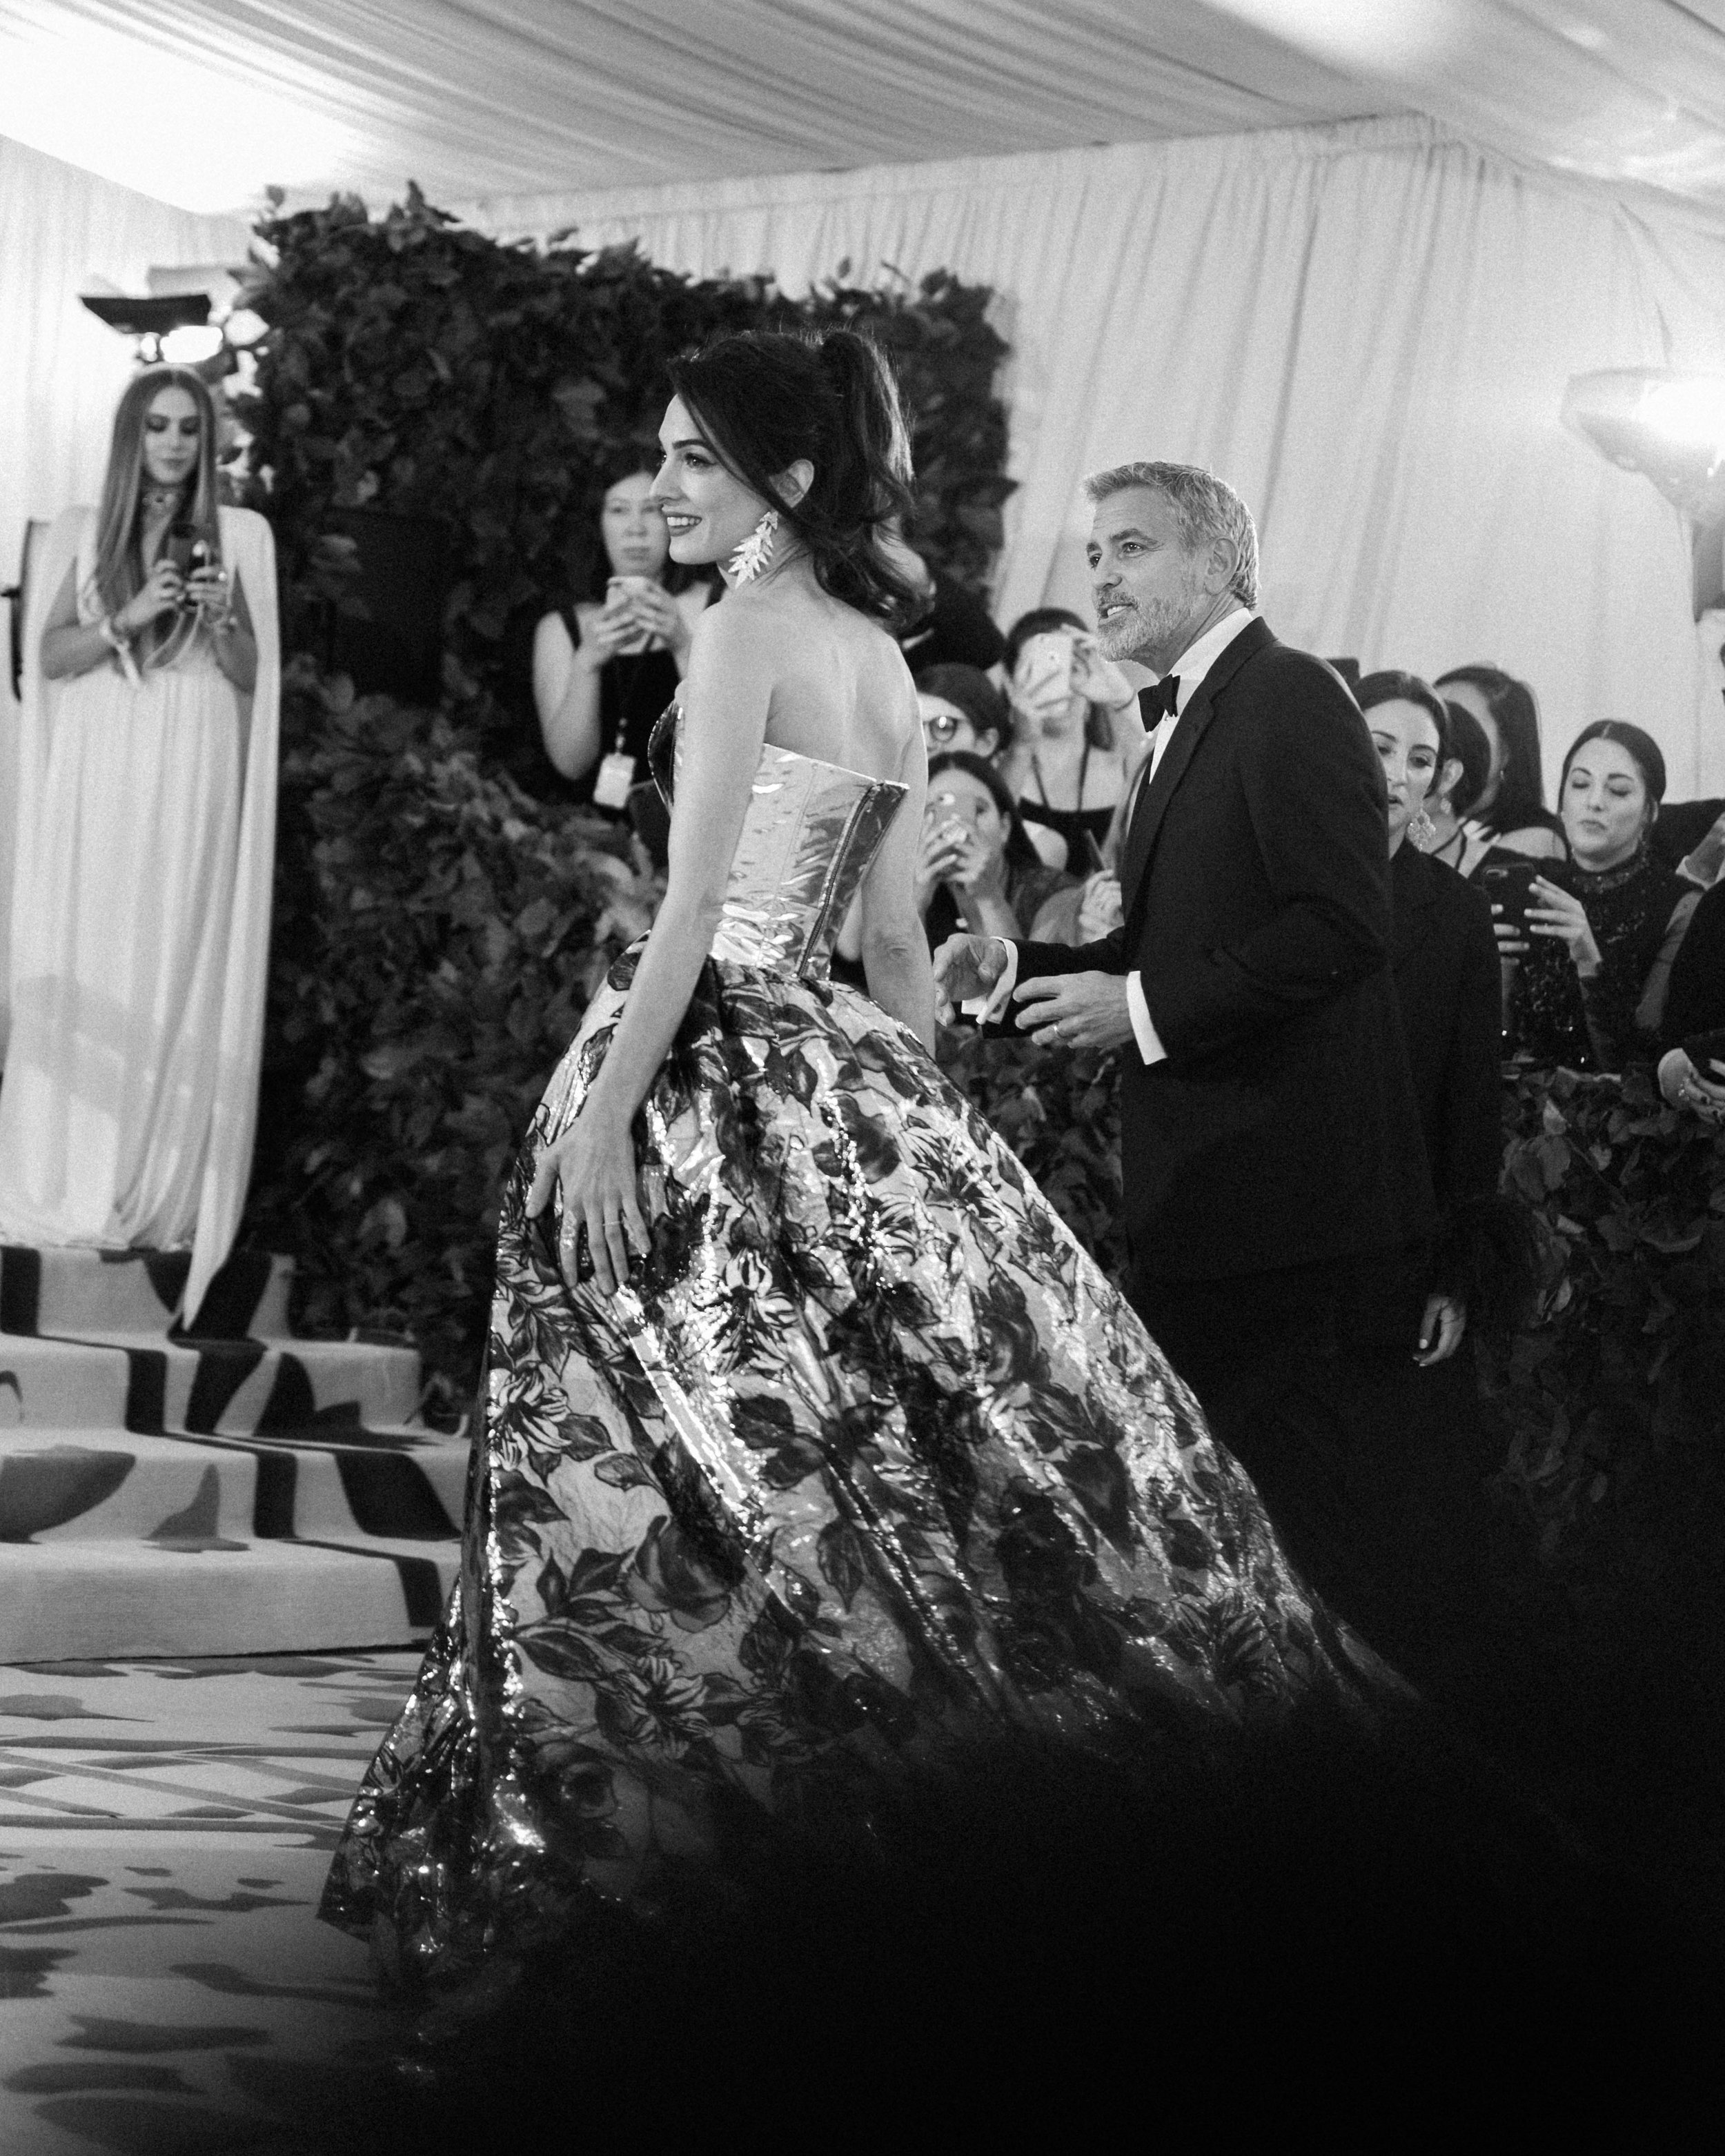 George Clooney and Amal Clooney at the 2018 Met Gala. Photograph by Siyu Tang.